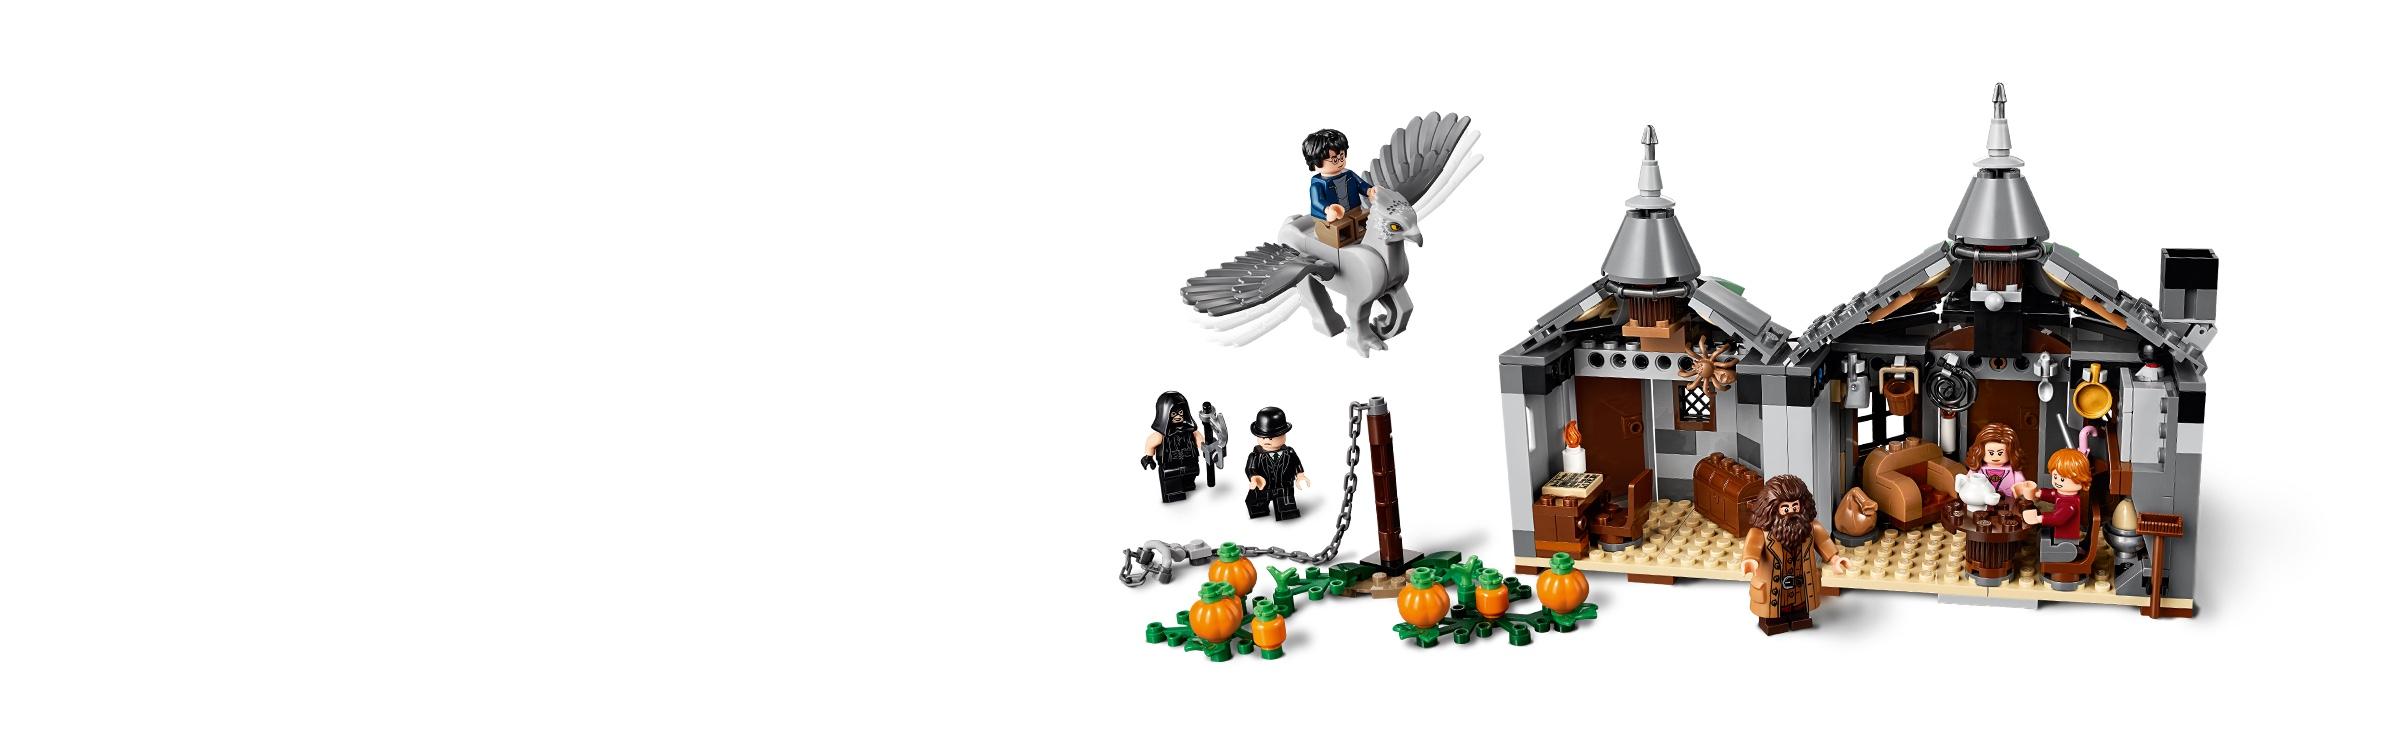 Hagrid/'s Hut Buckbeak/'s Rescue LEGO Brand New LEGO-75947